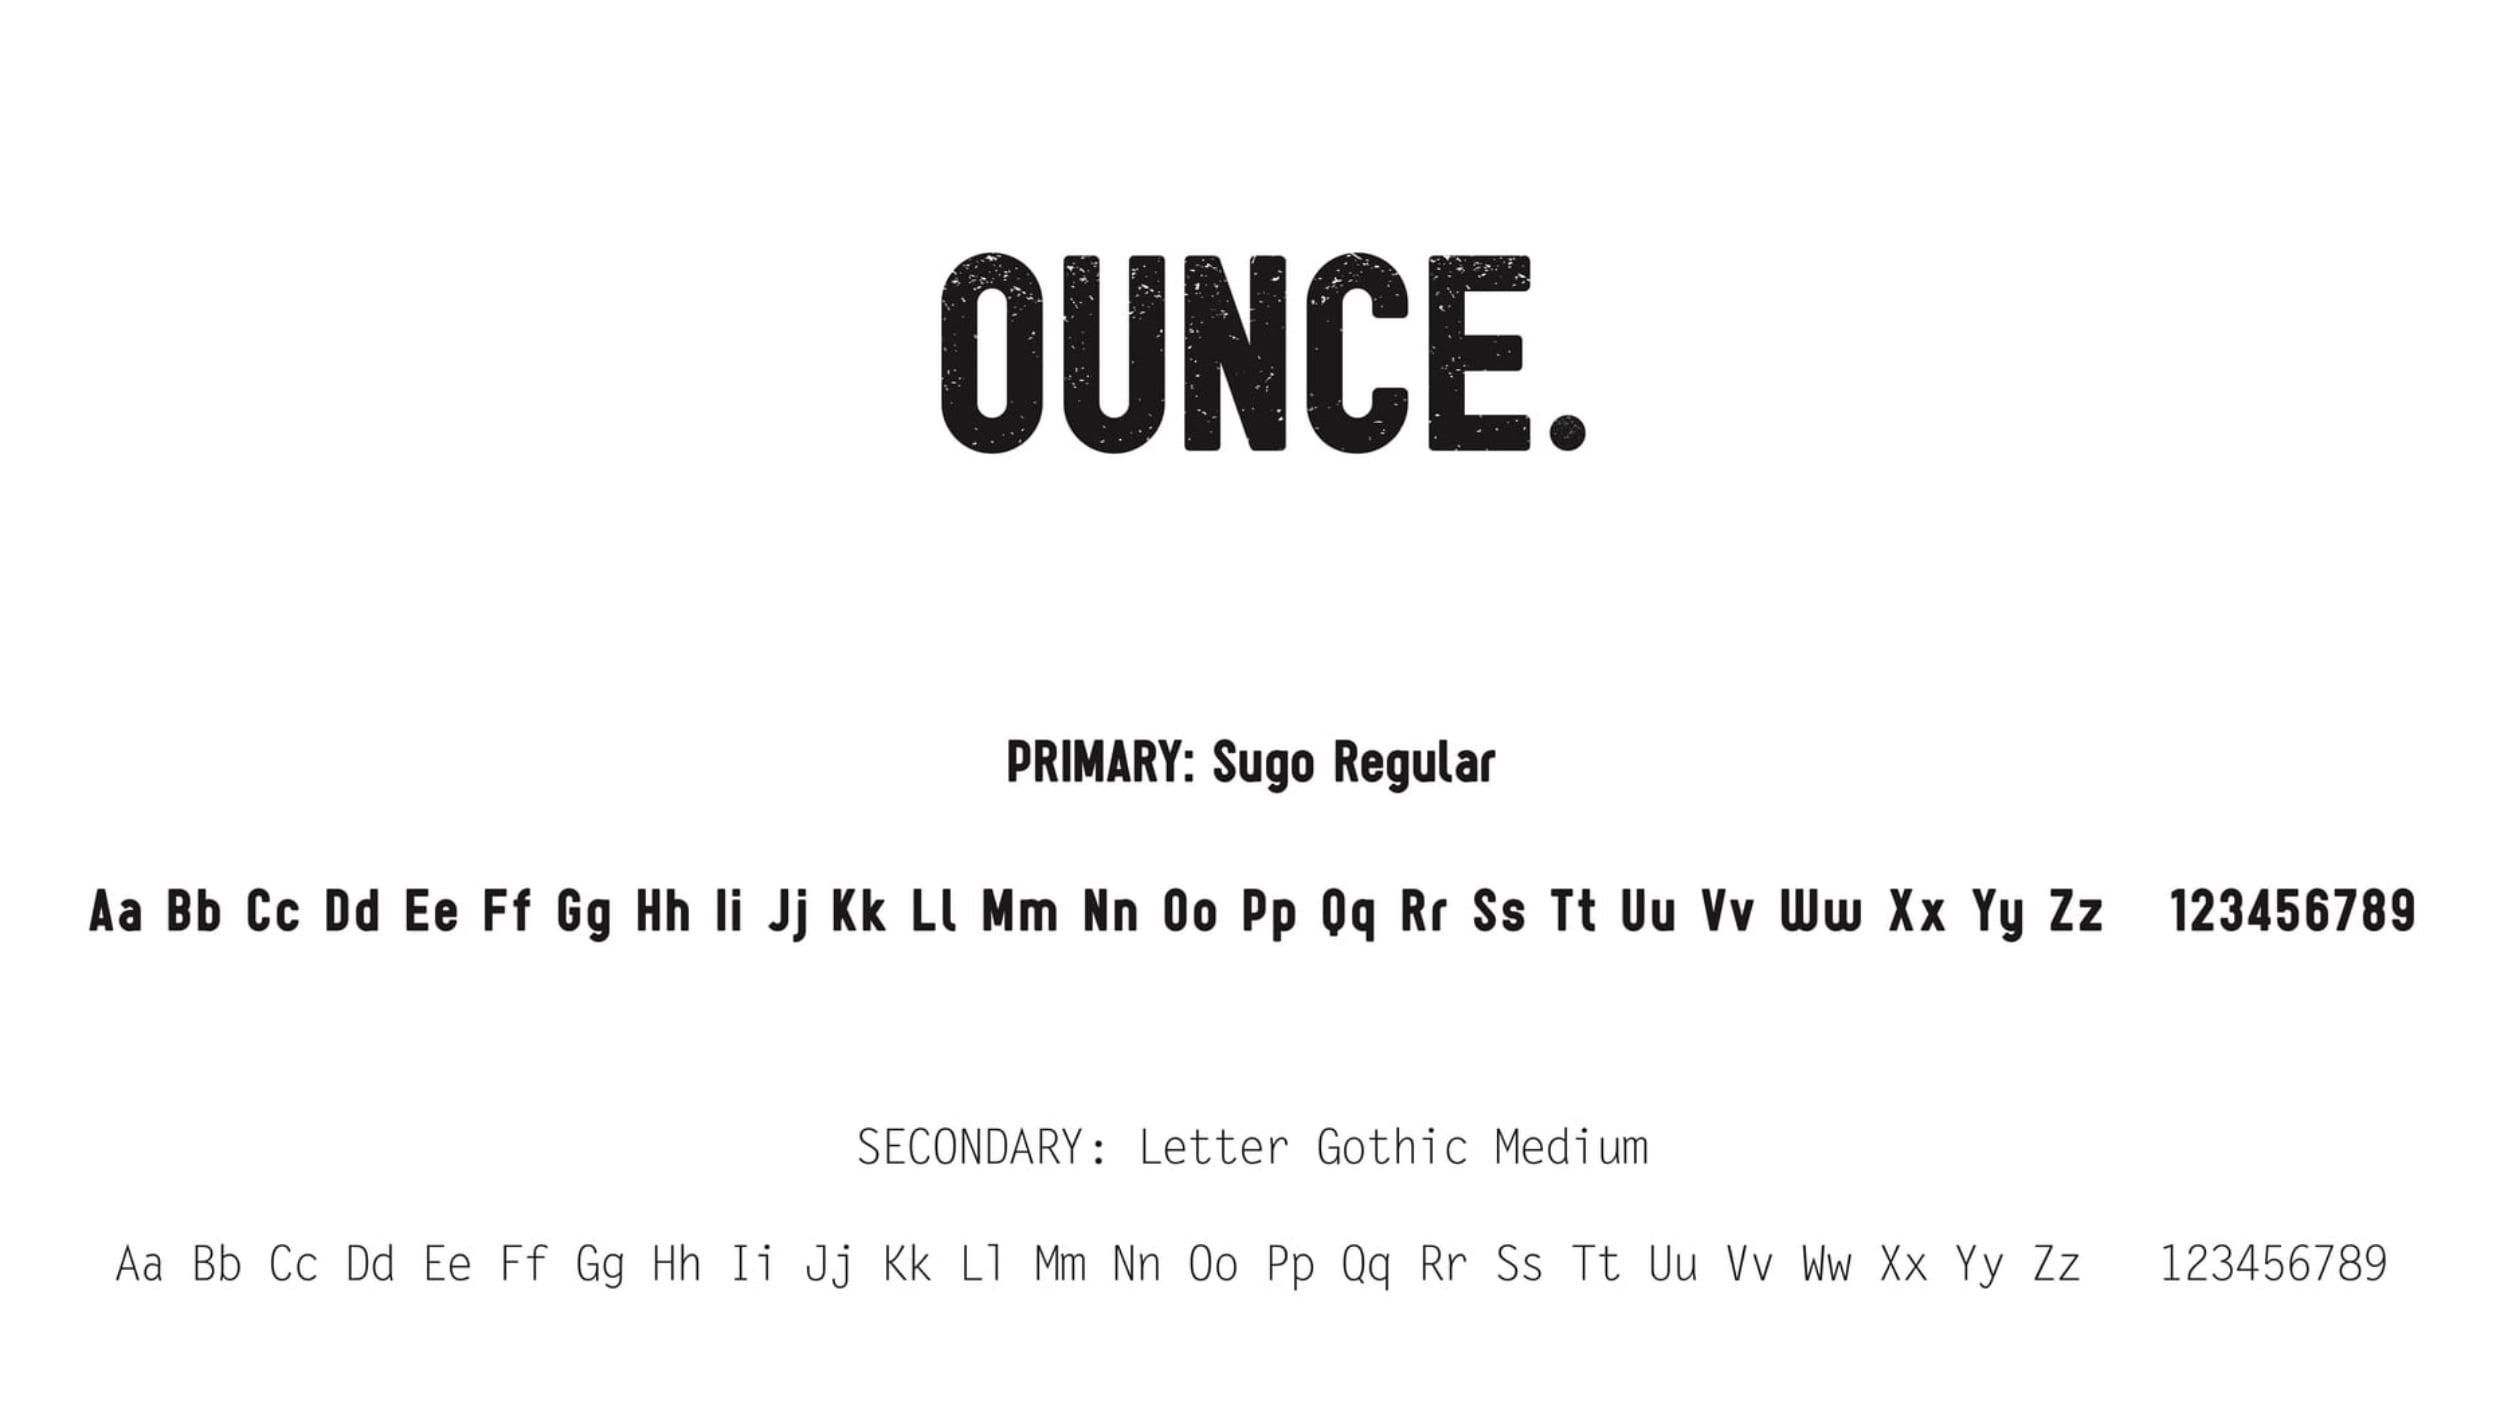 Typography treatment by Natsuki Hayashi